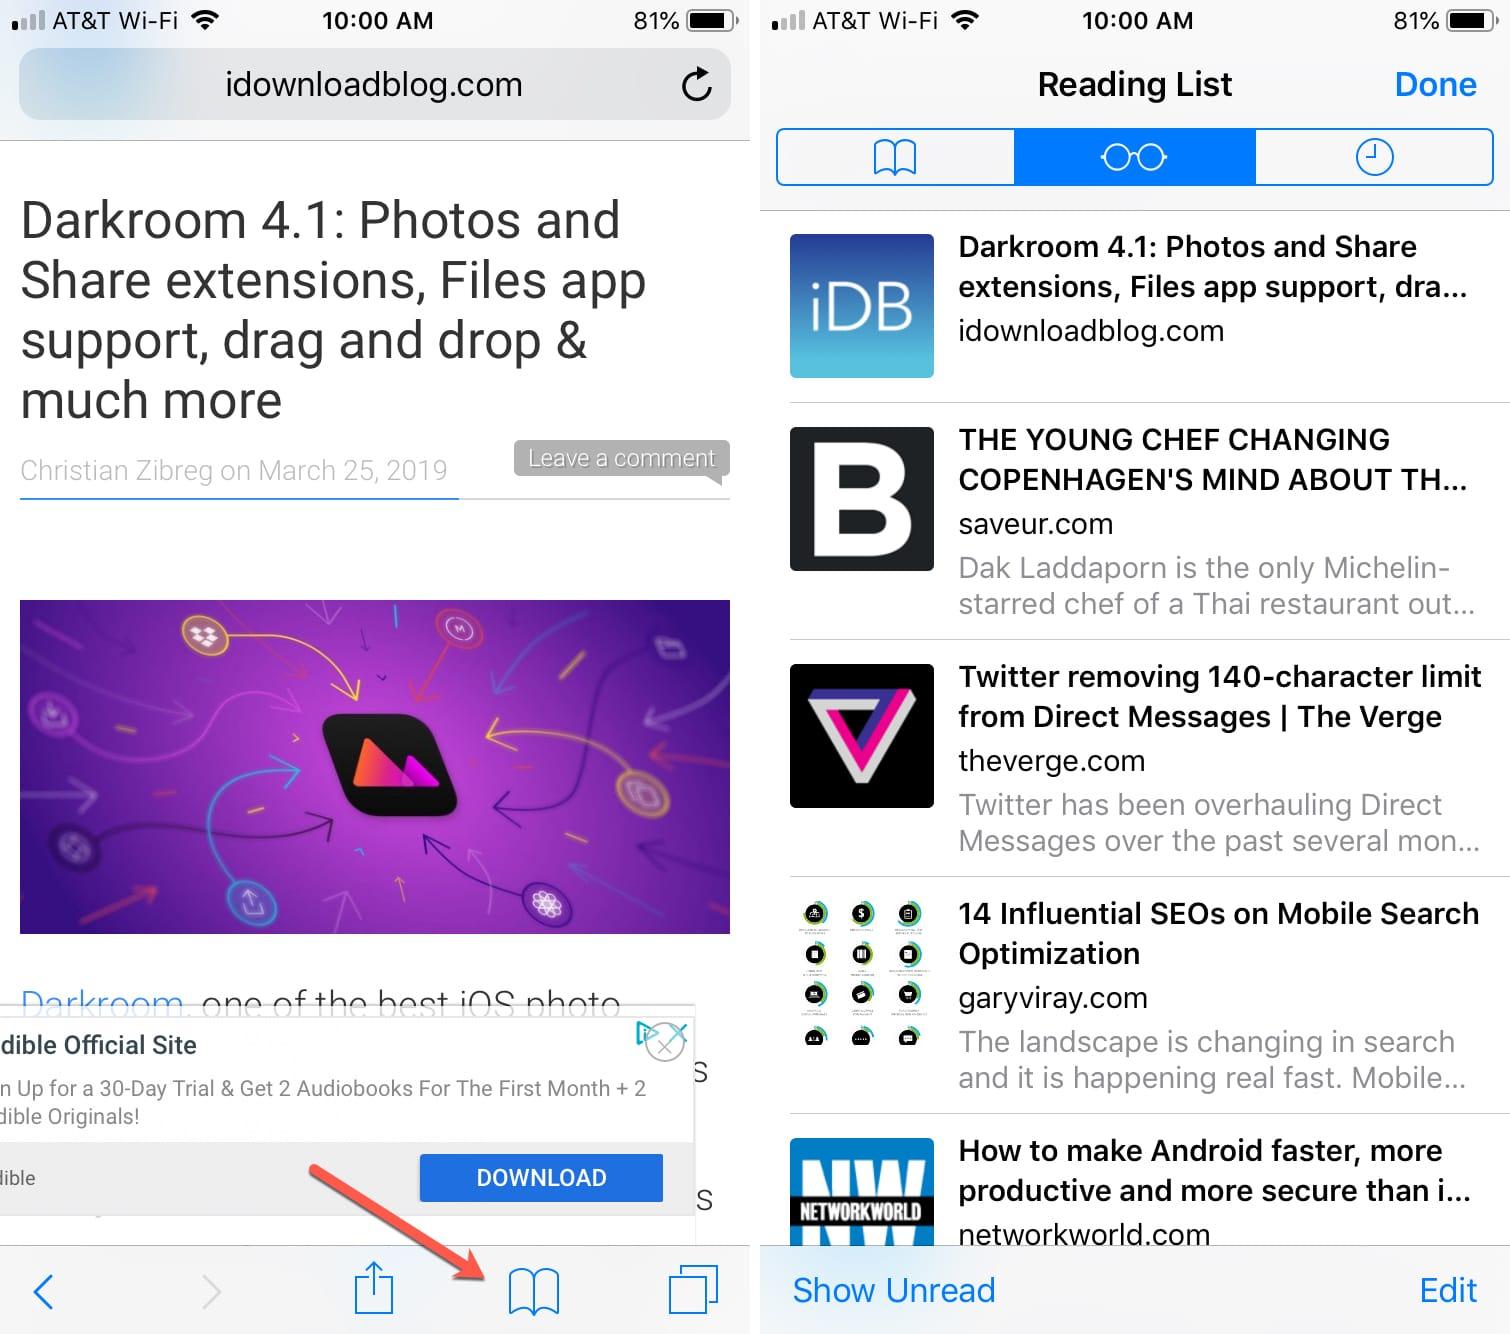 Acceda a la lista de lectura de Safari fuera de línea del iPhone